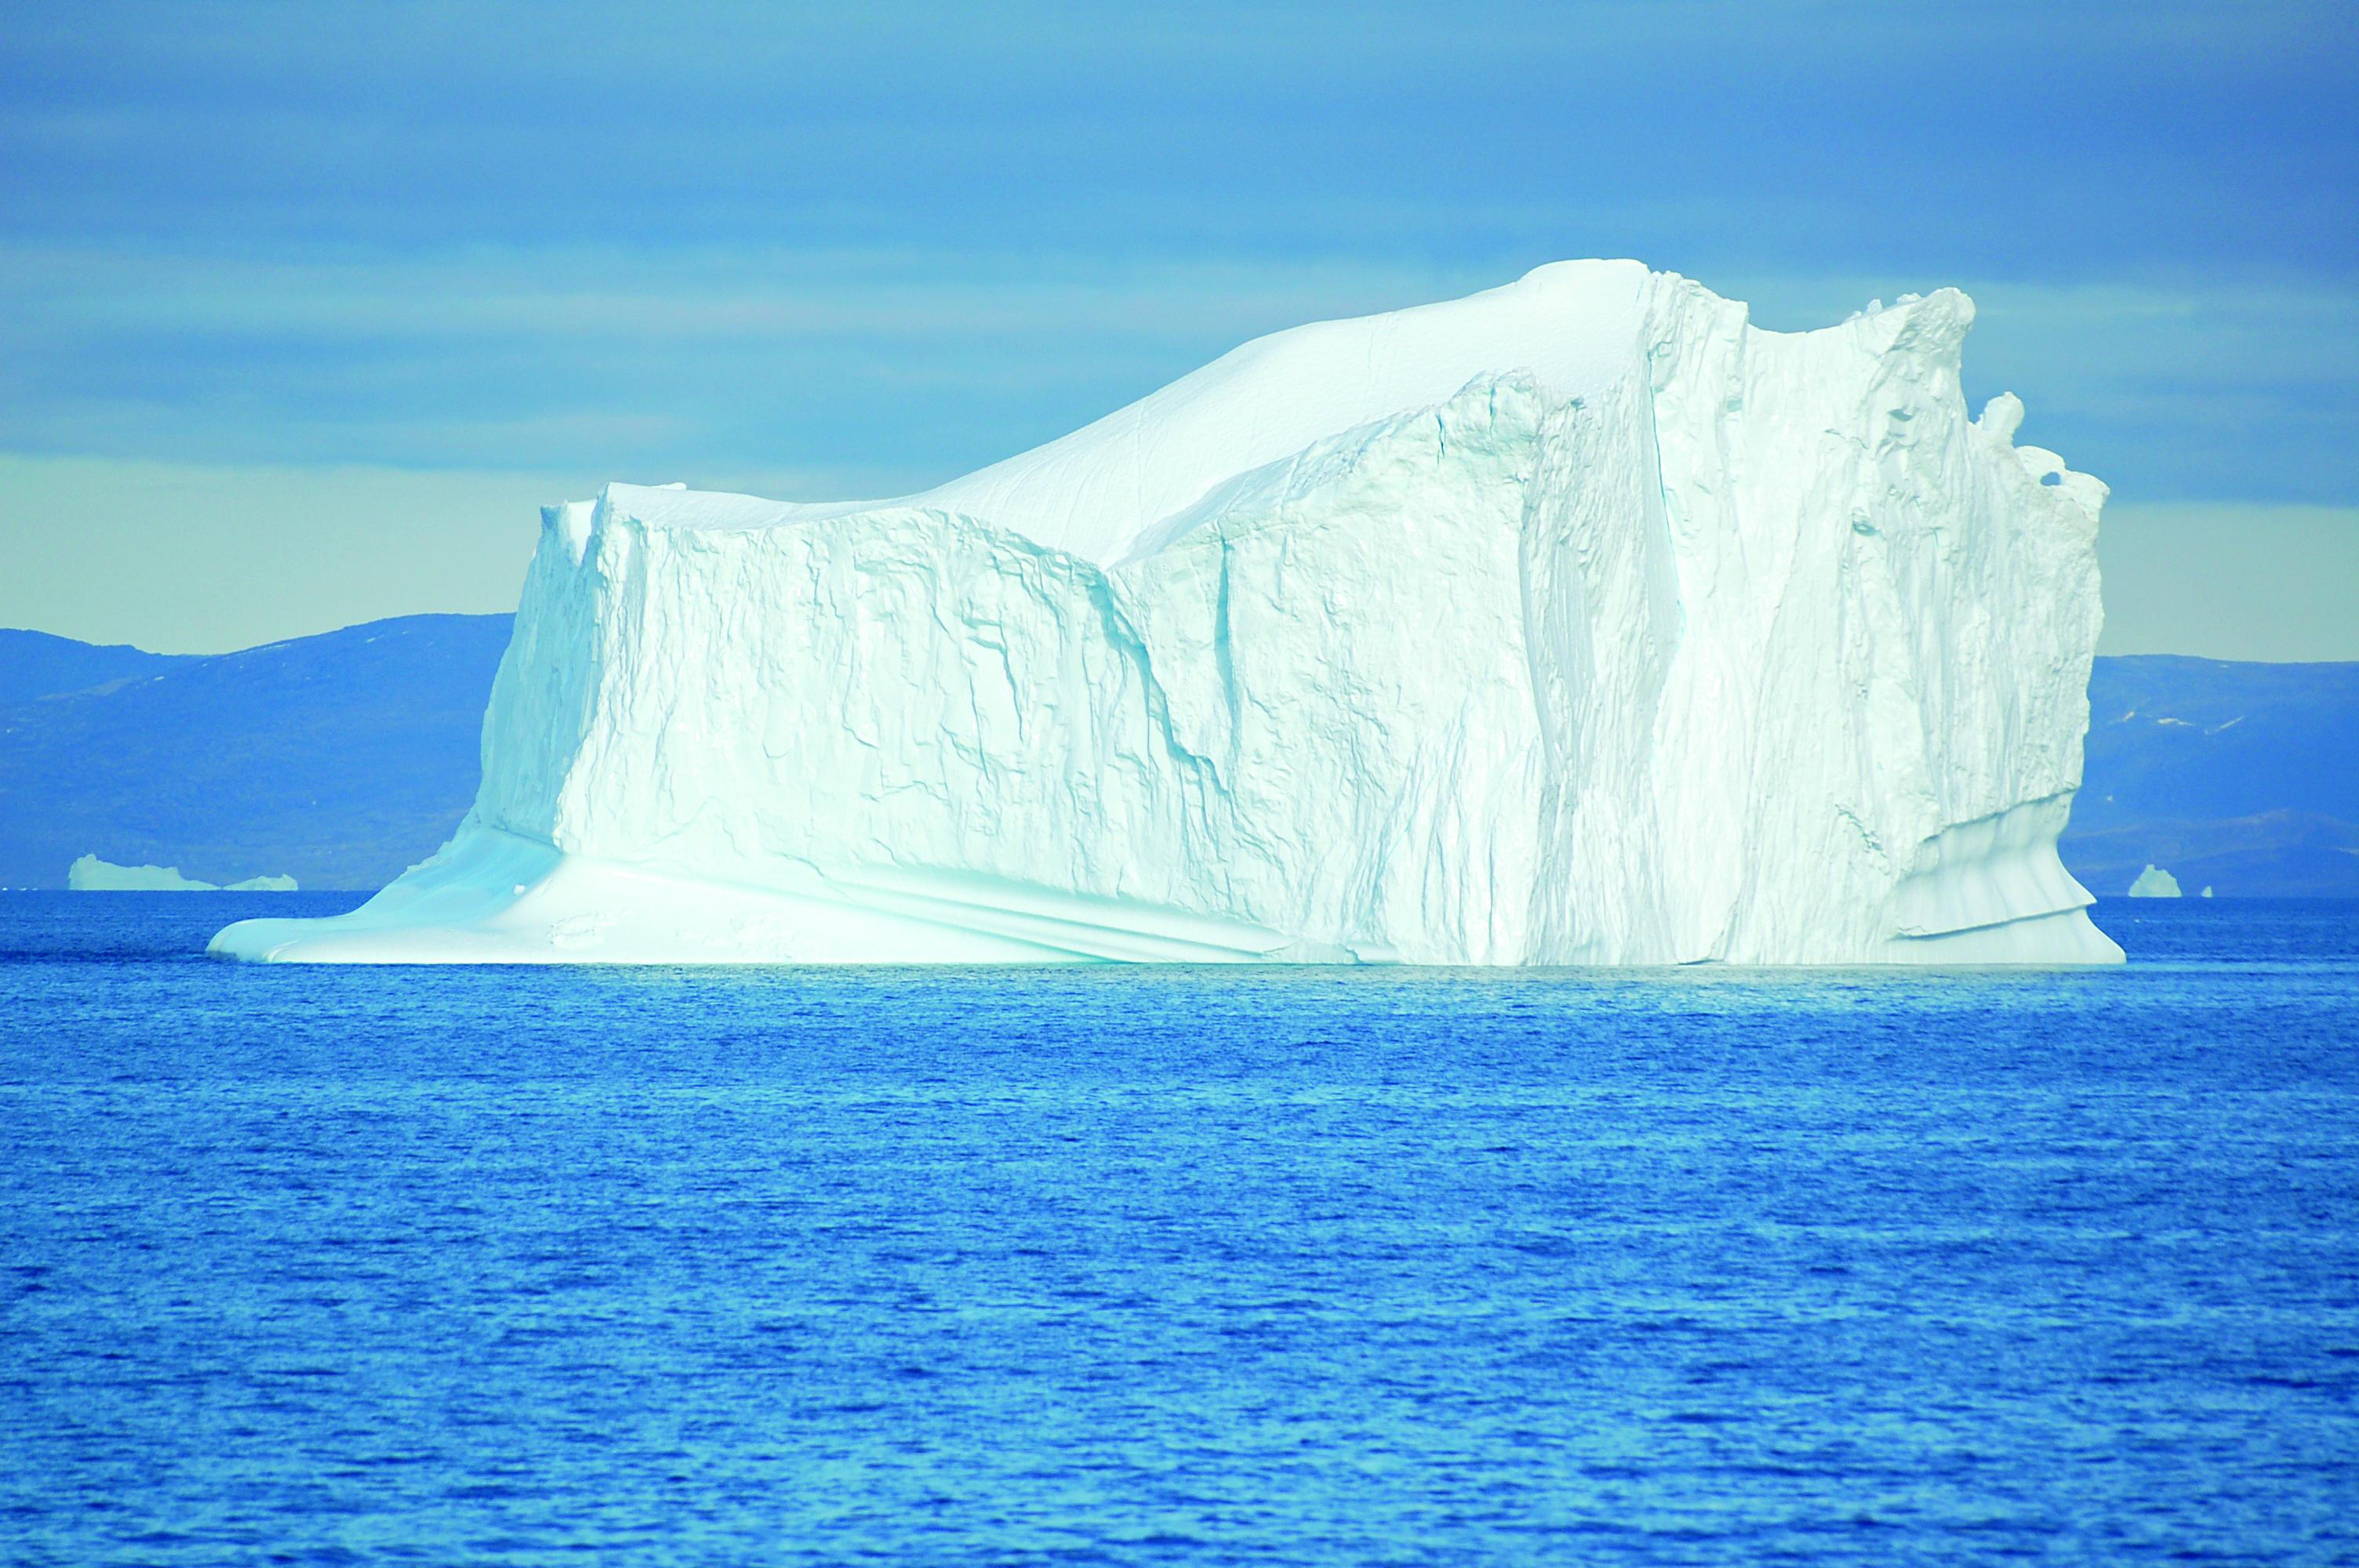 TW1021_iceberg.jpg